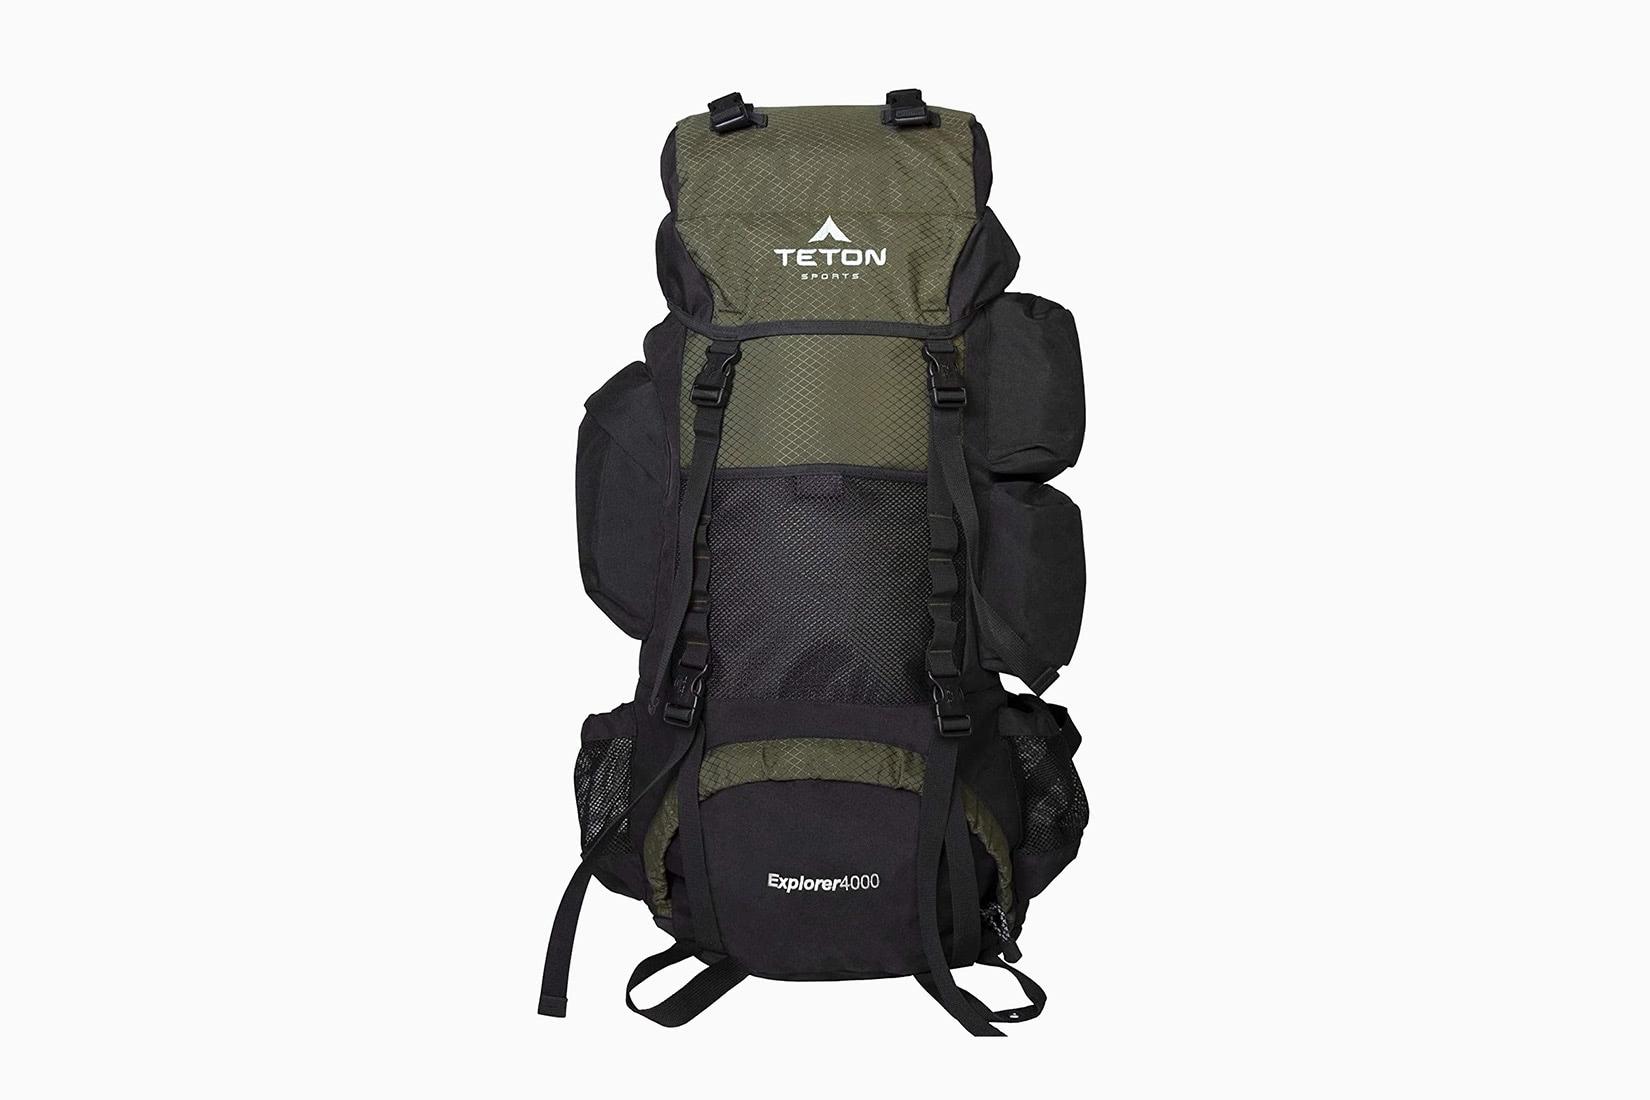 best travel backpack TETON sports explorer 4000 - Luxe Digital